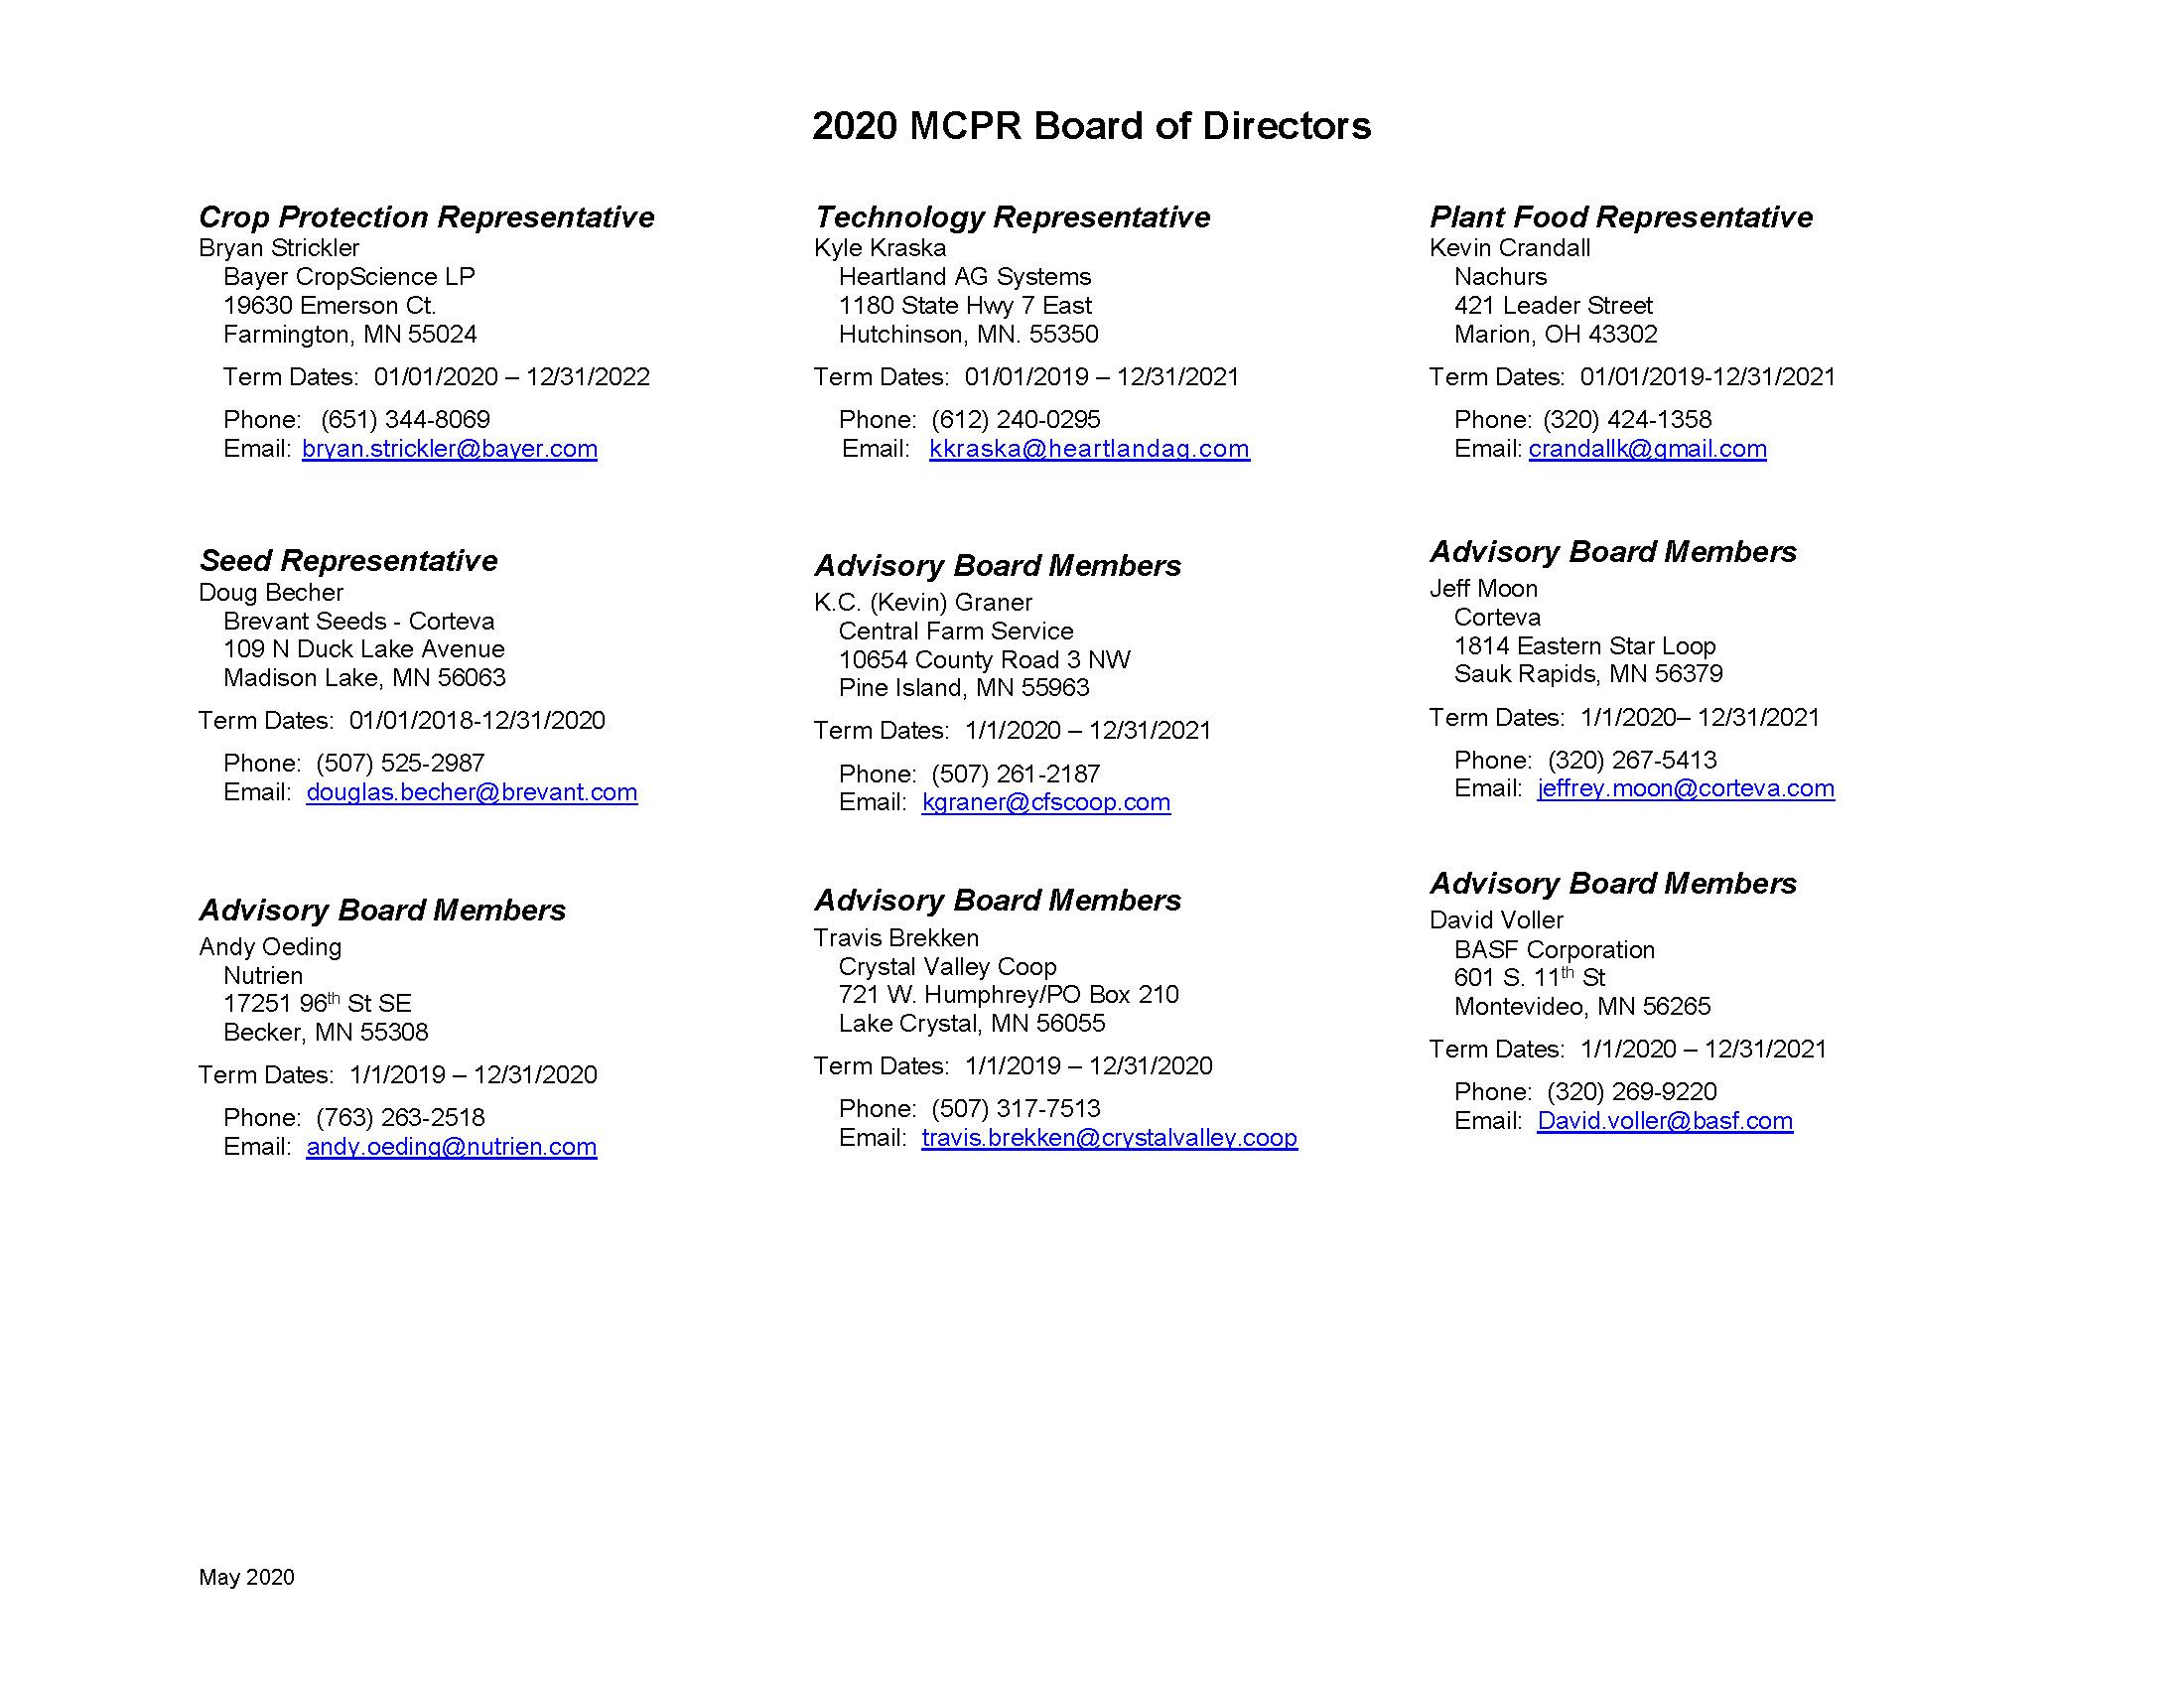 2020 MCPR Board of Directors_May2020_Page_2